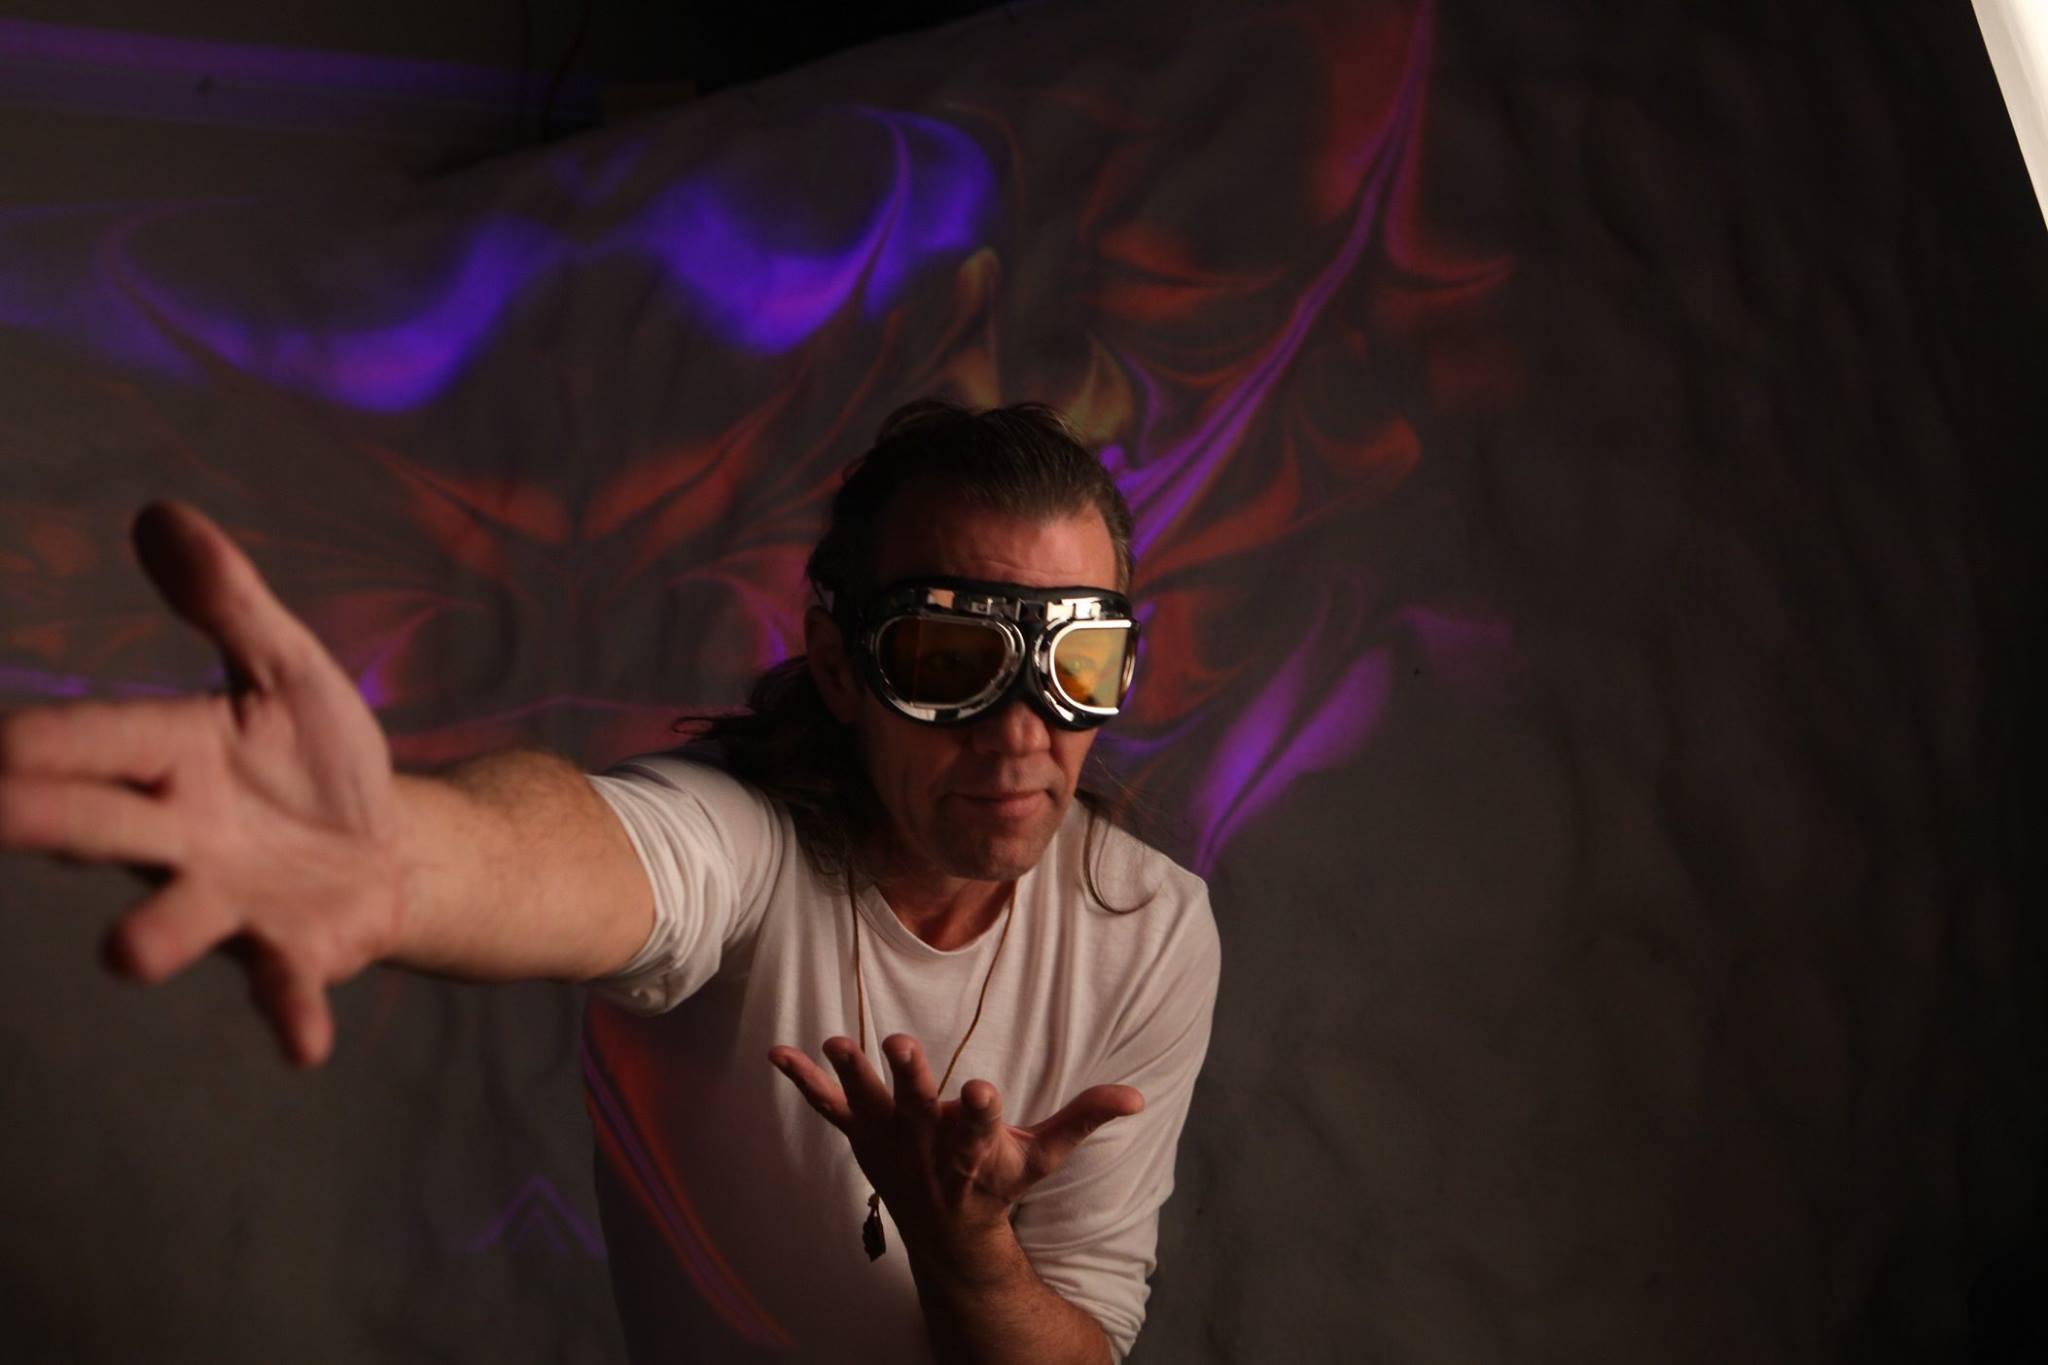 Brandnew Live & DJ Sets by IMIX aka FRANZ JOHANN